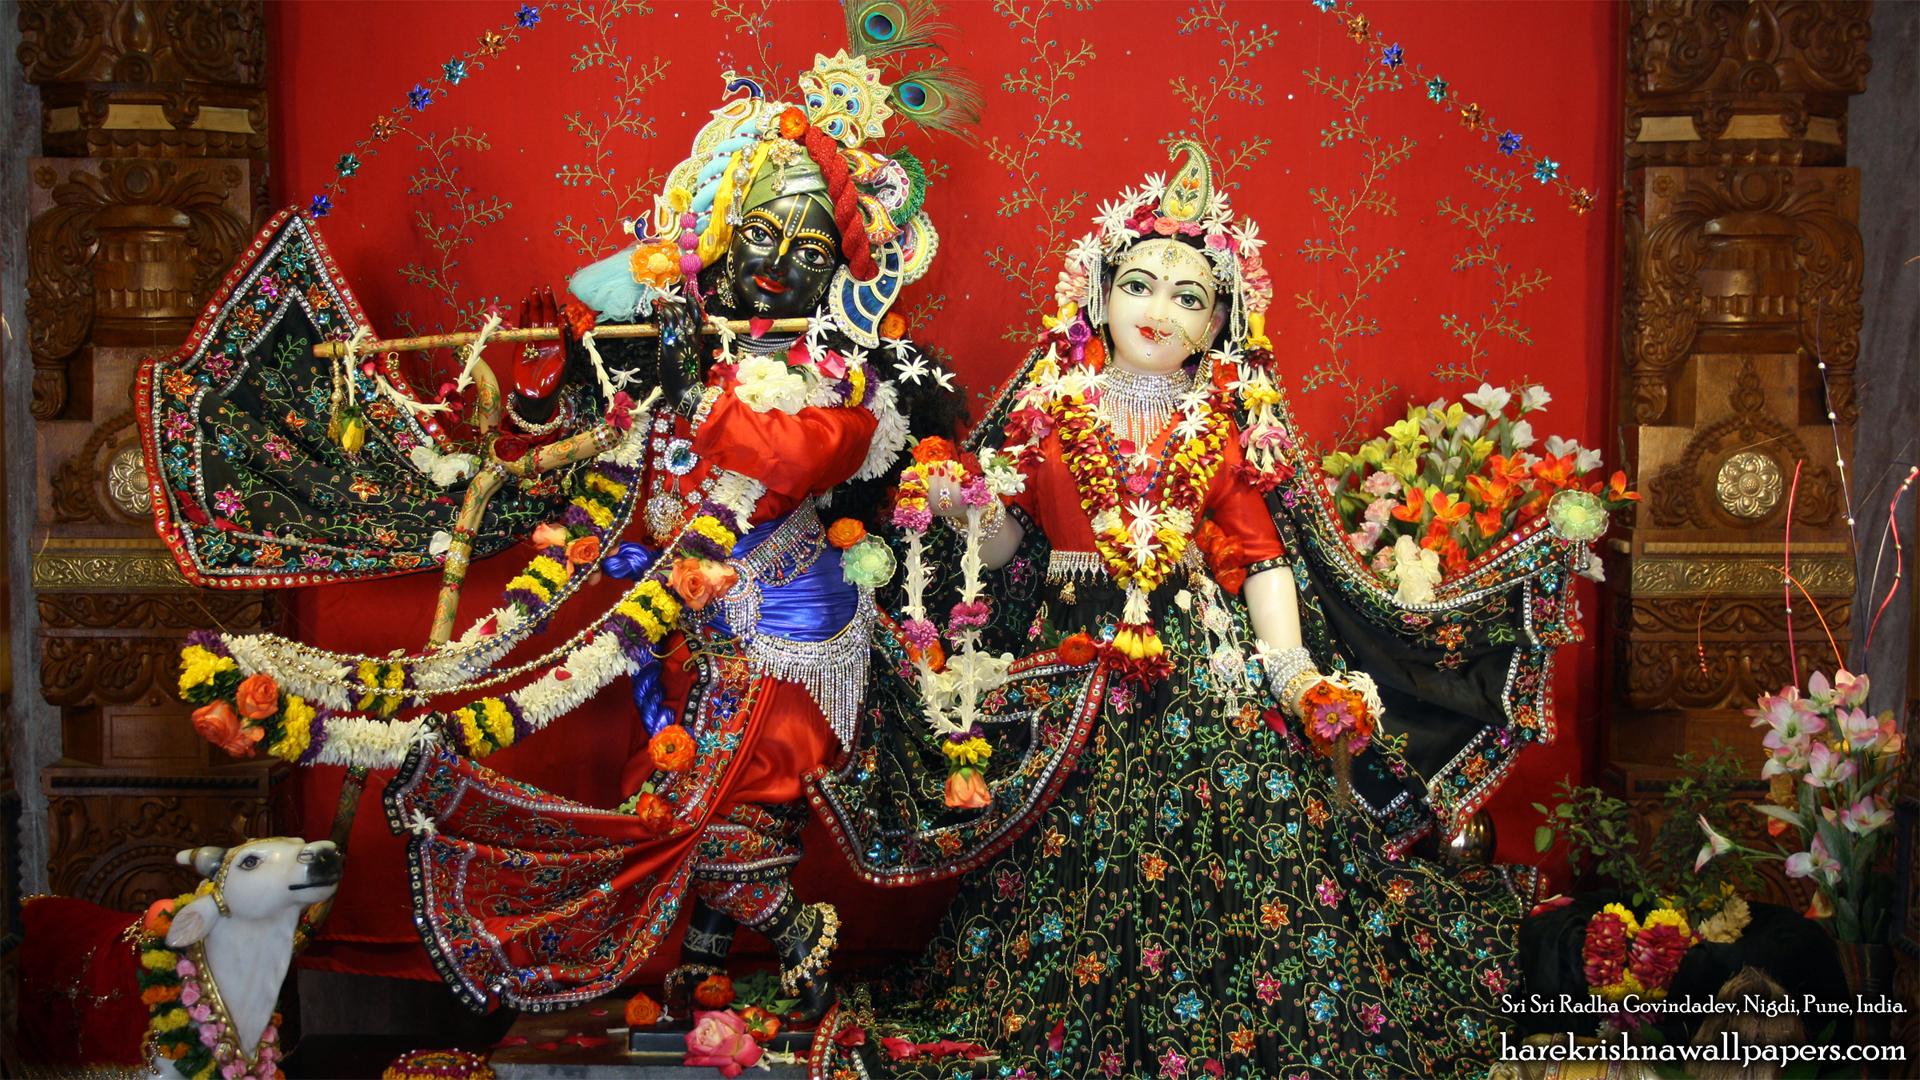 Sri Sri Radha Govind Wallpaper (042) Size 1920x1080 Download